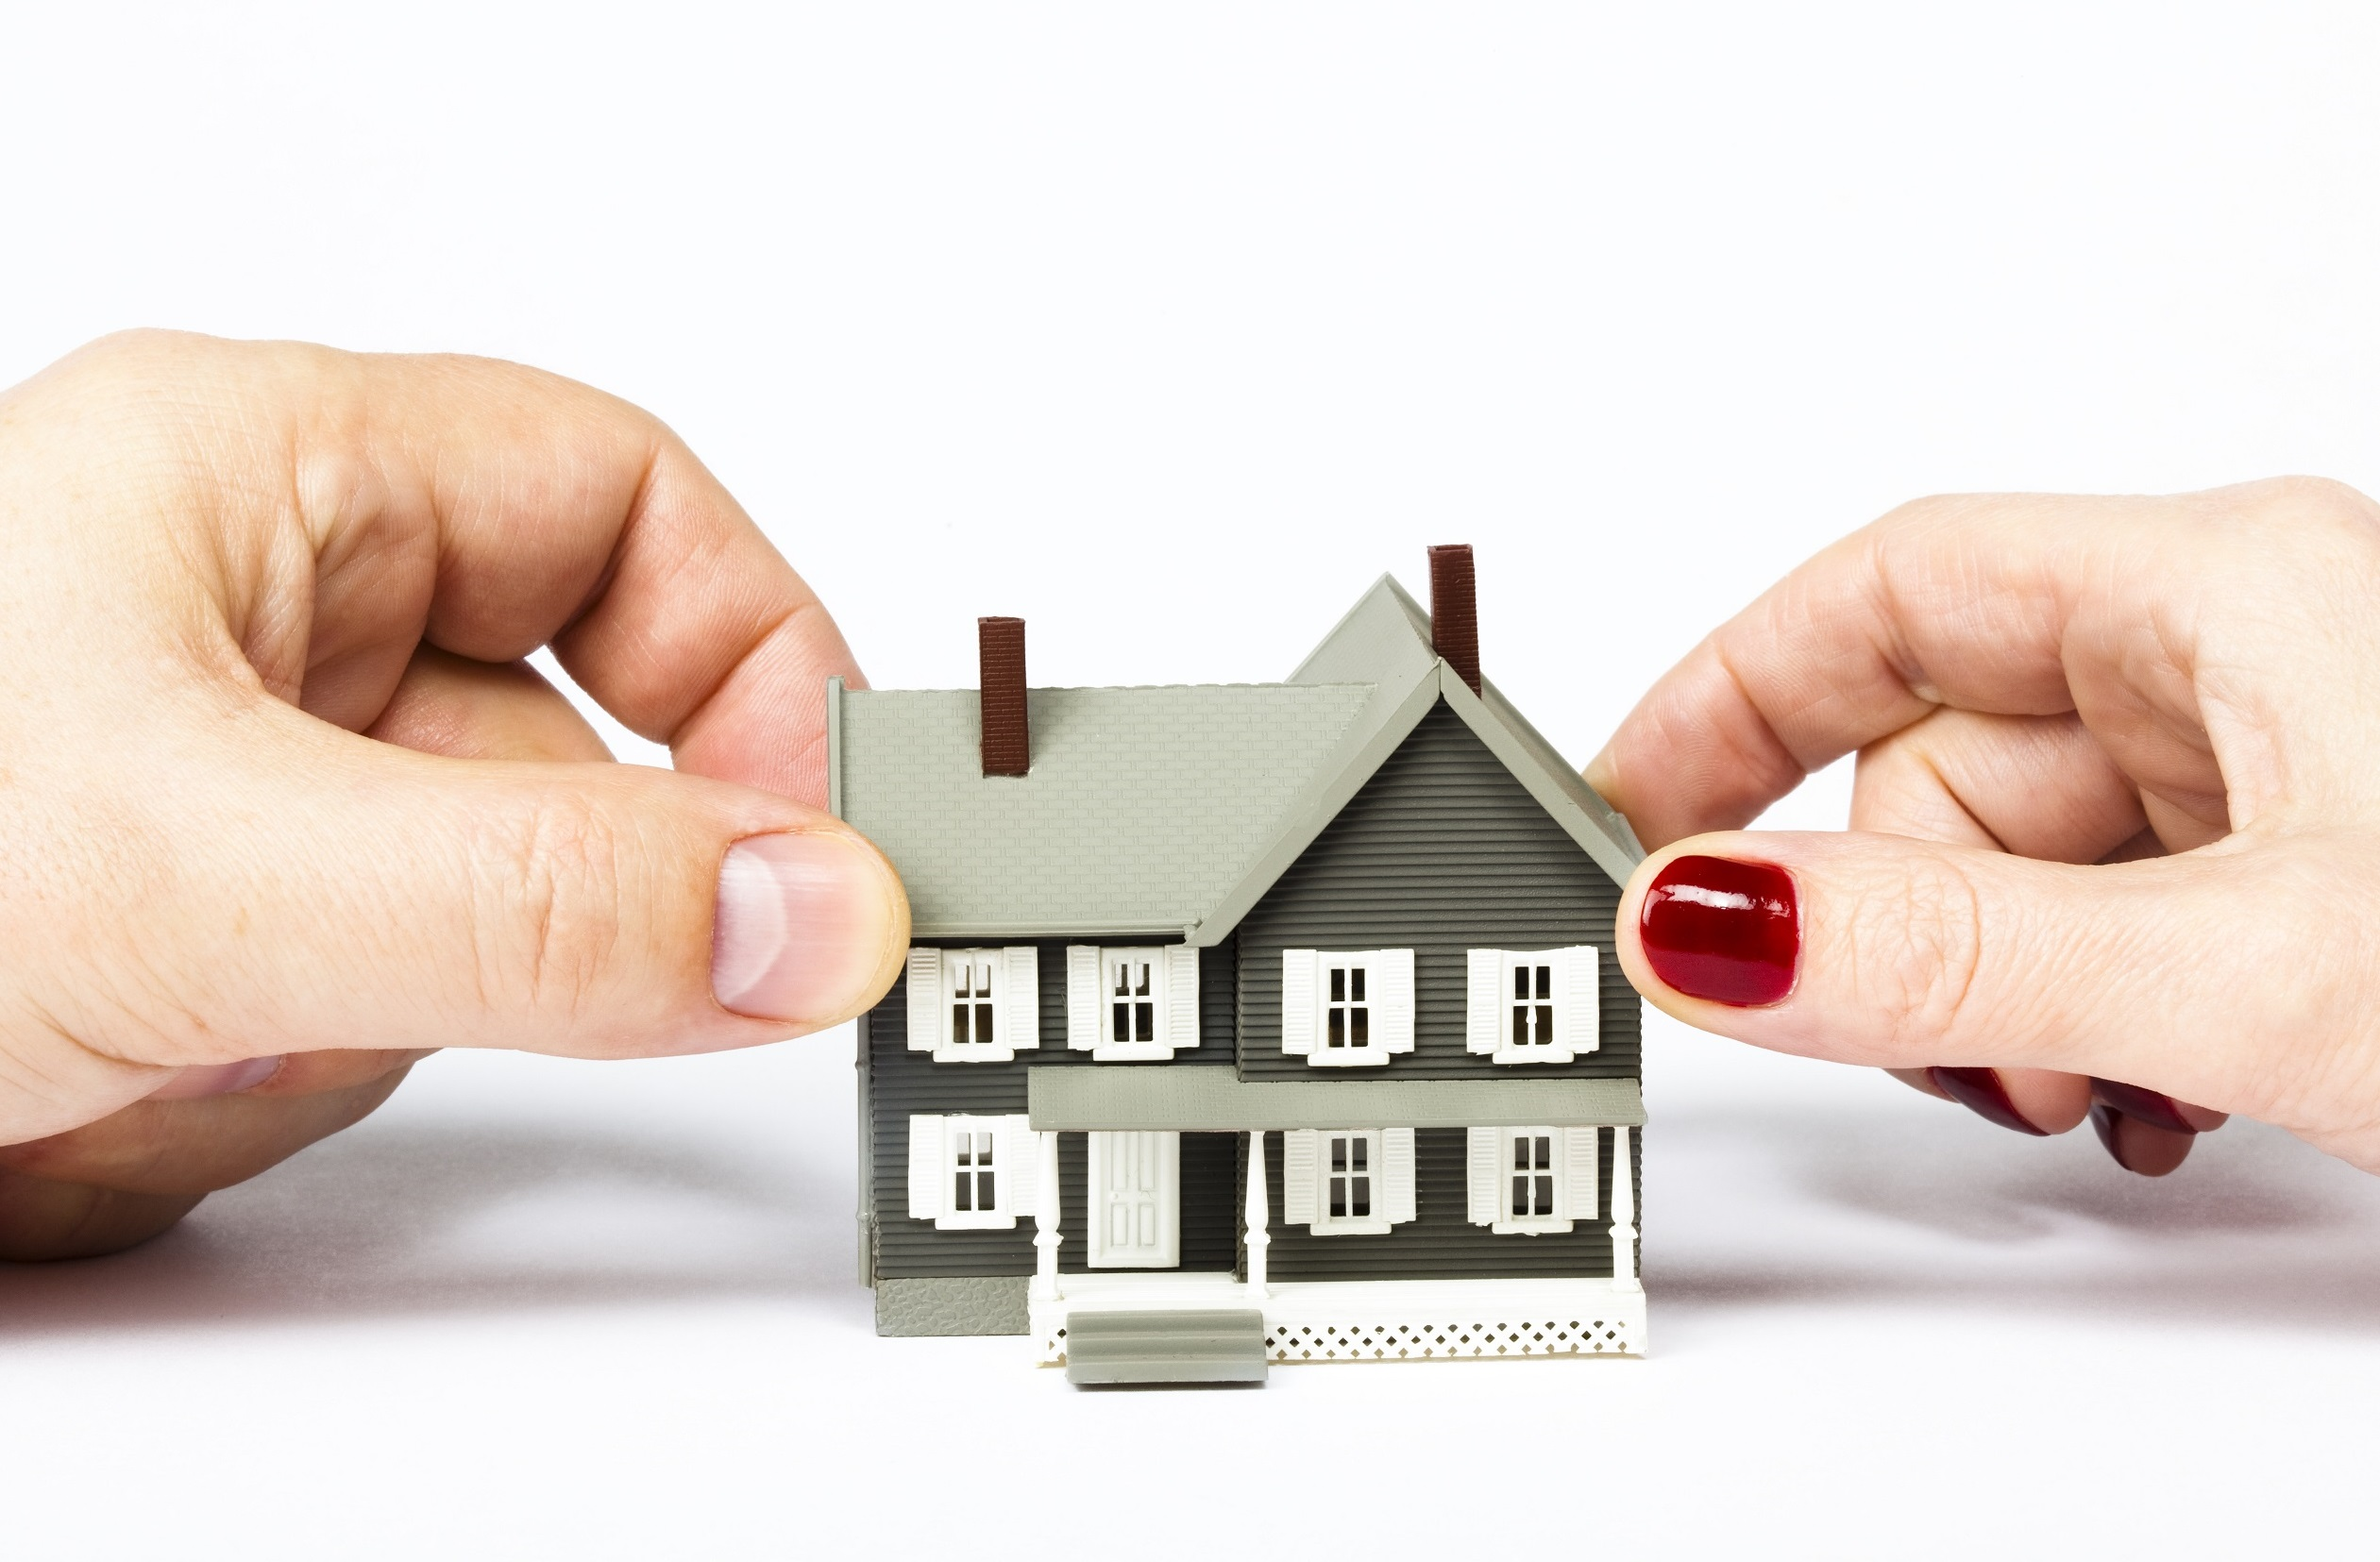 Соглашение о разделе имущества супругов образец